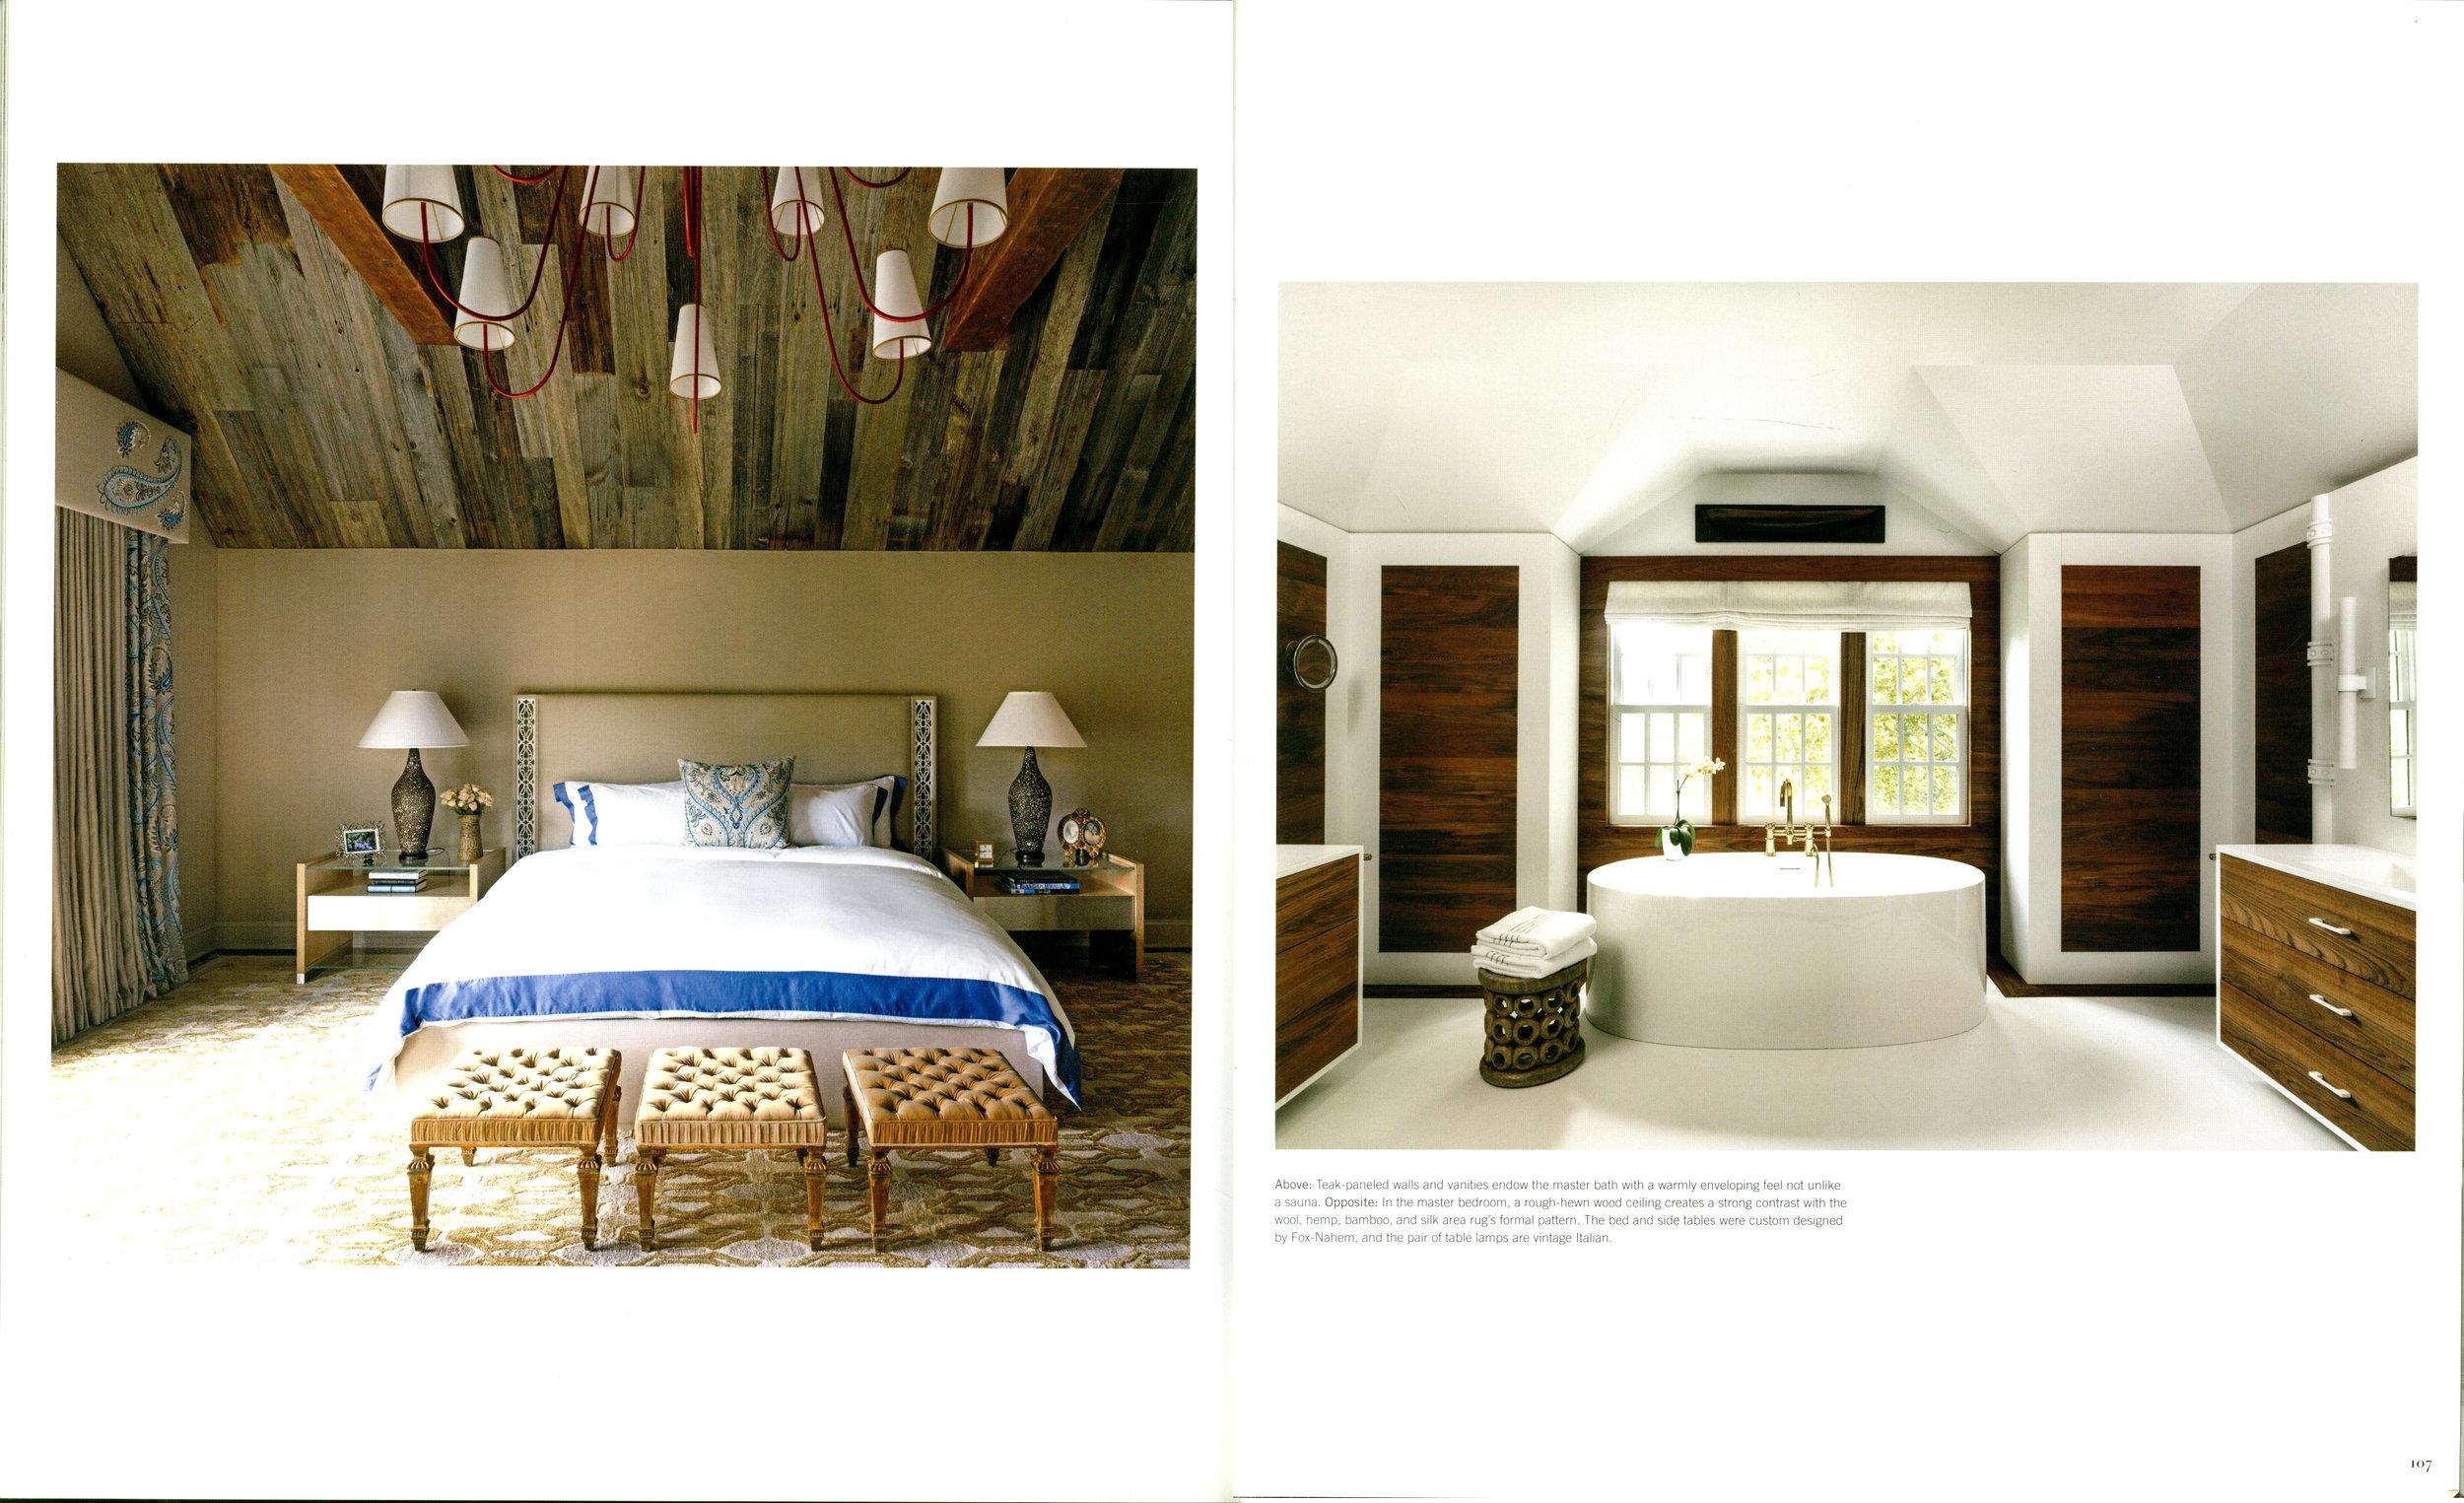 Design in the hamptons spread 7.jpg